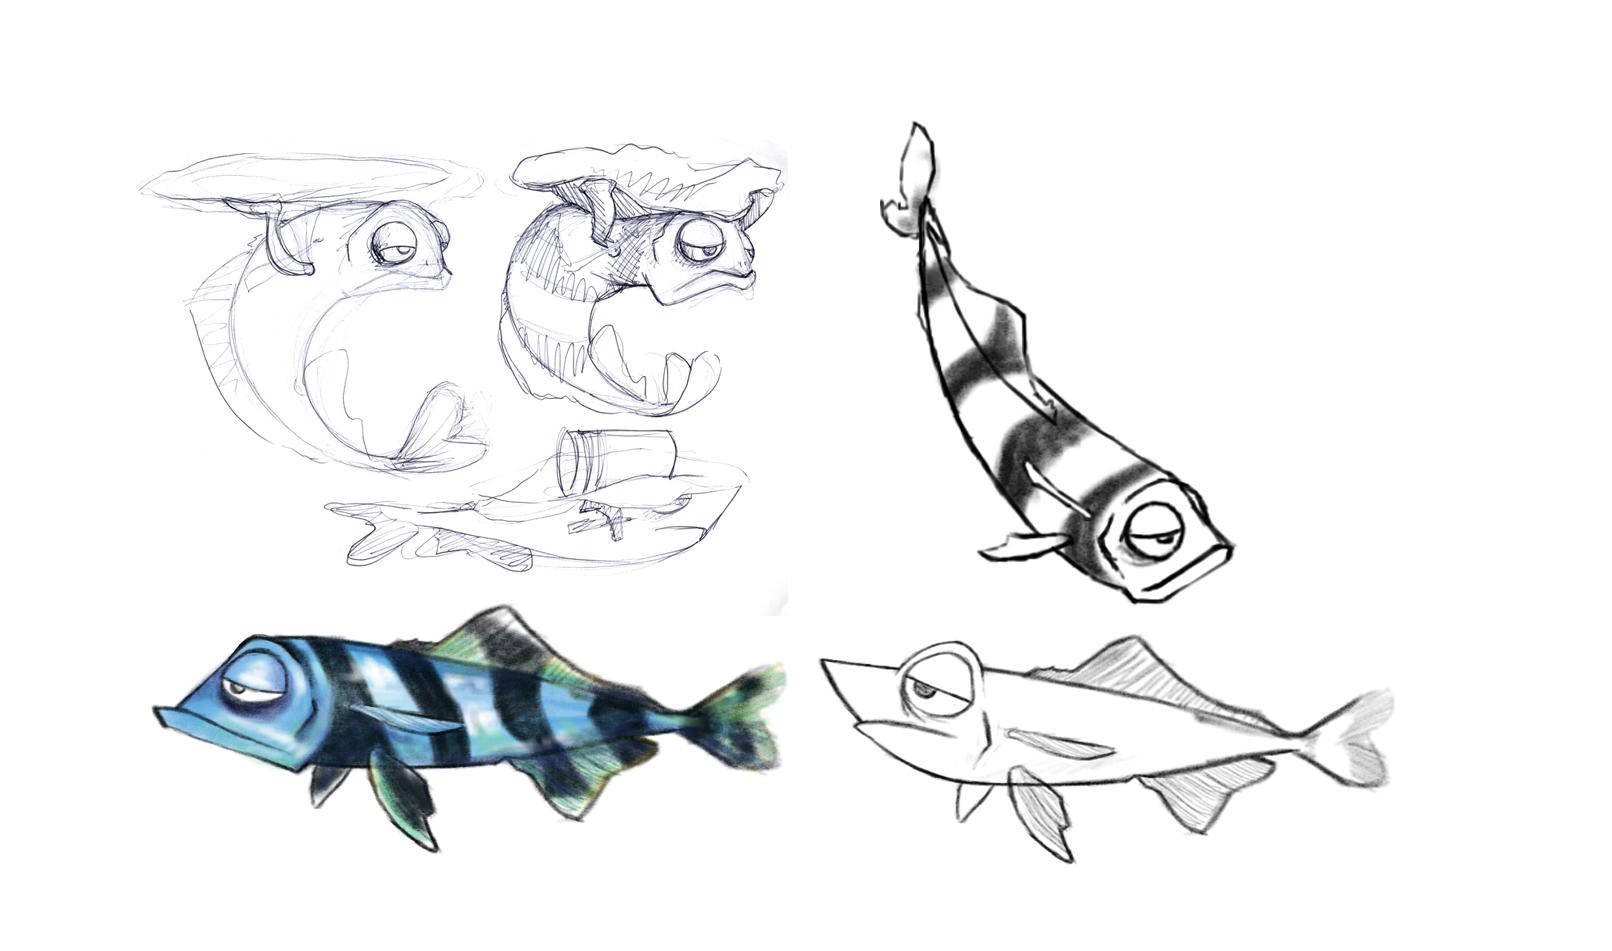 pilotfish_design01.jpg